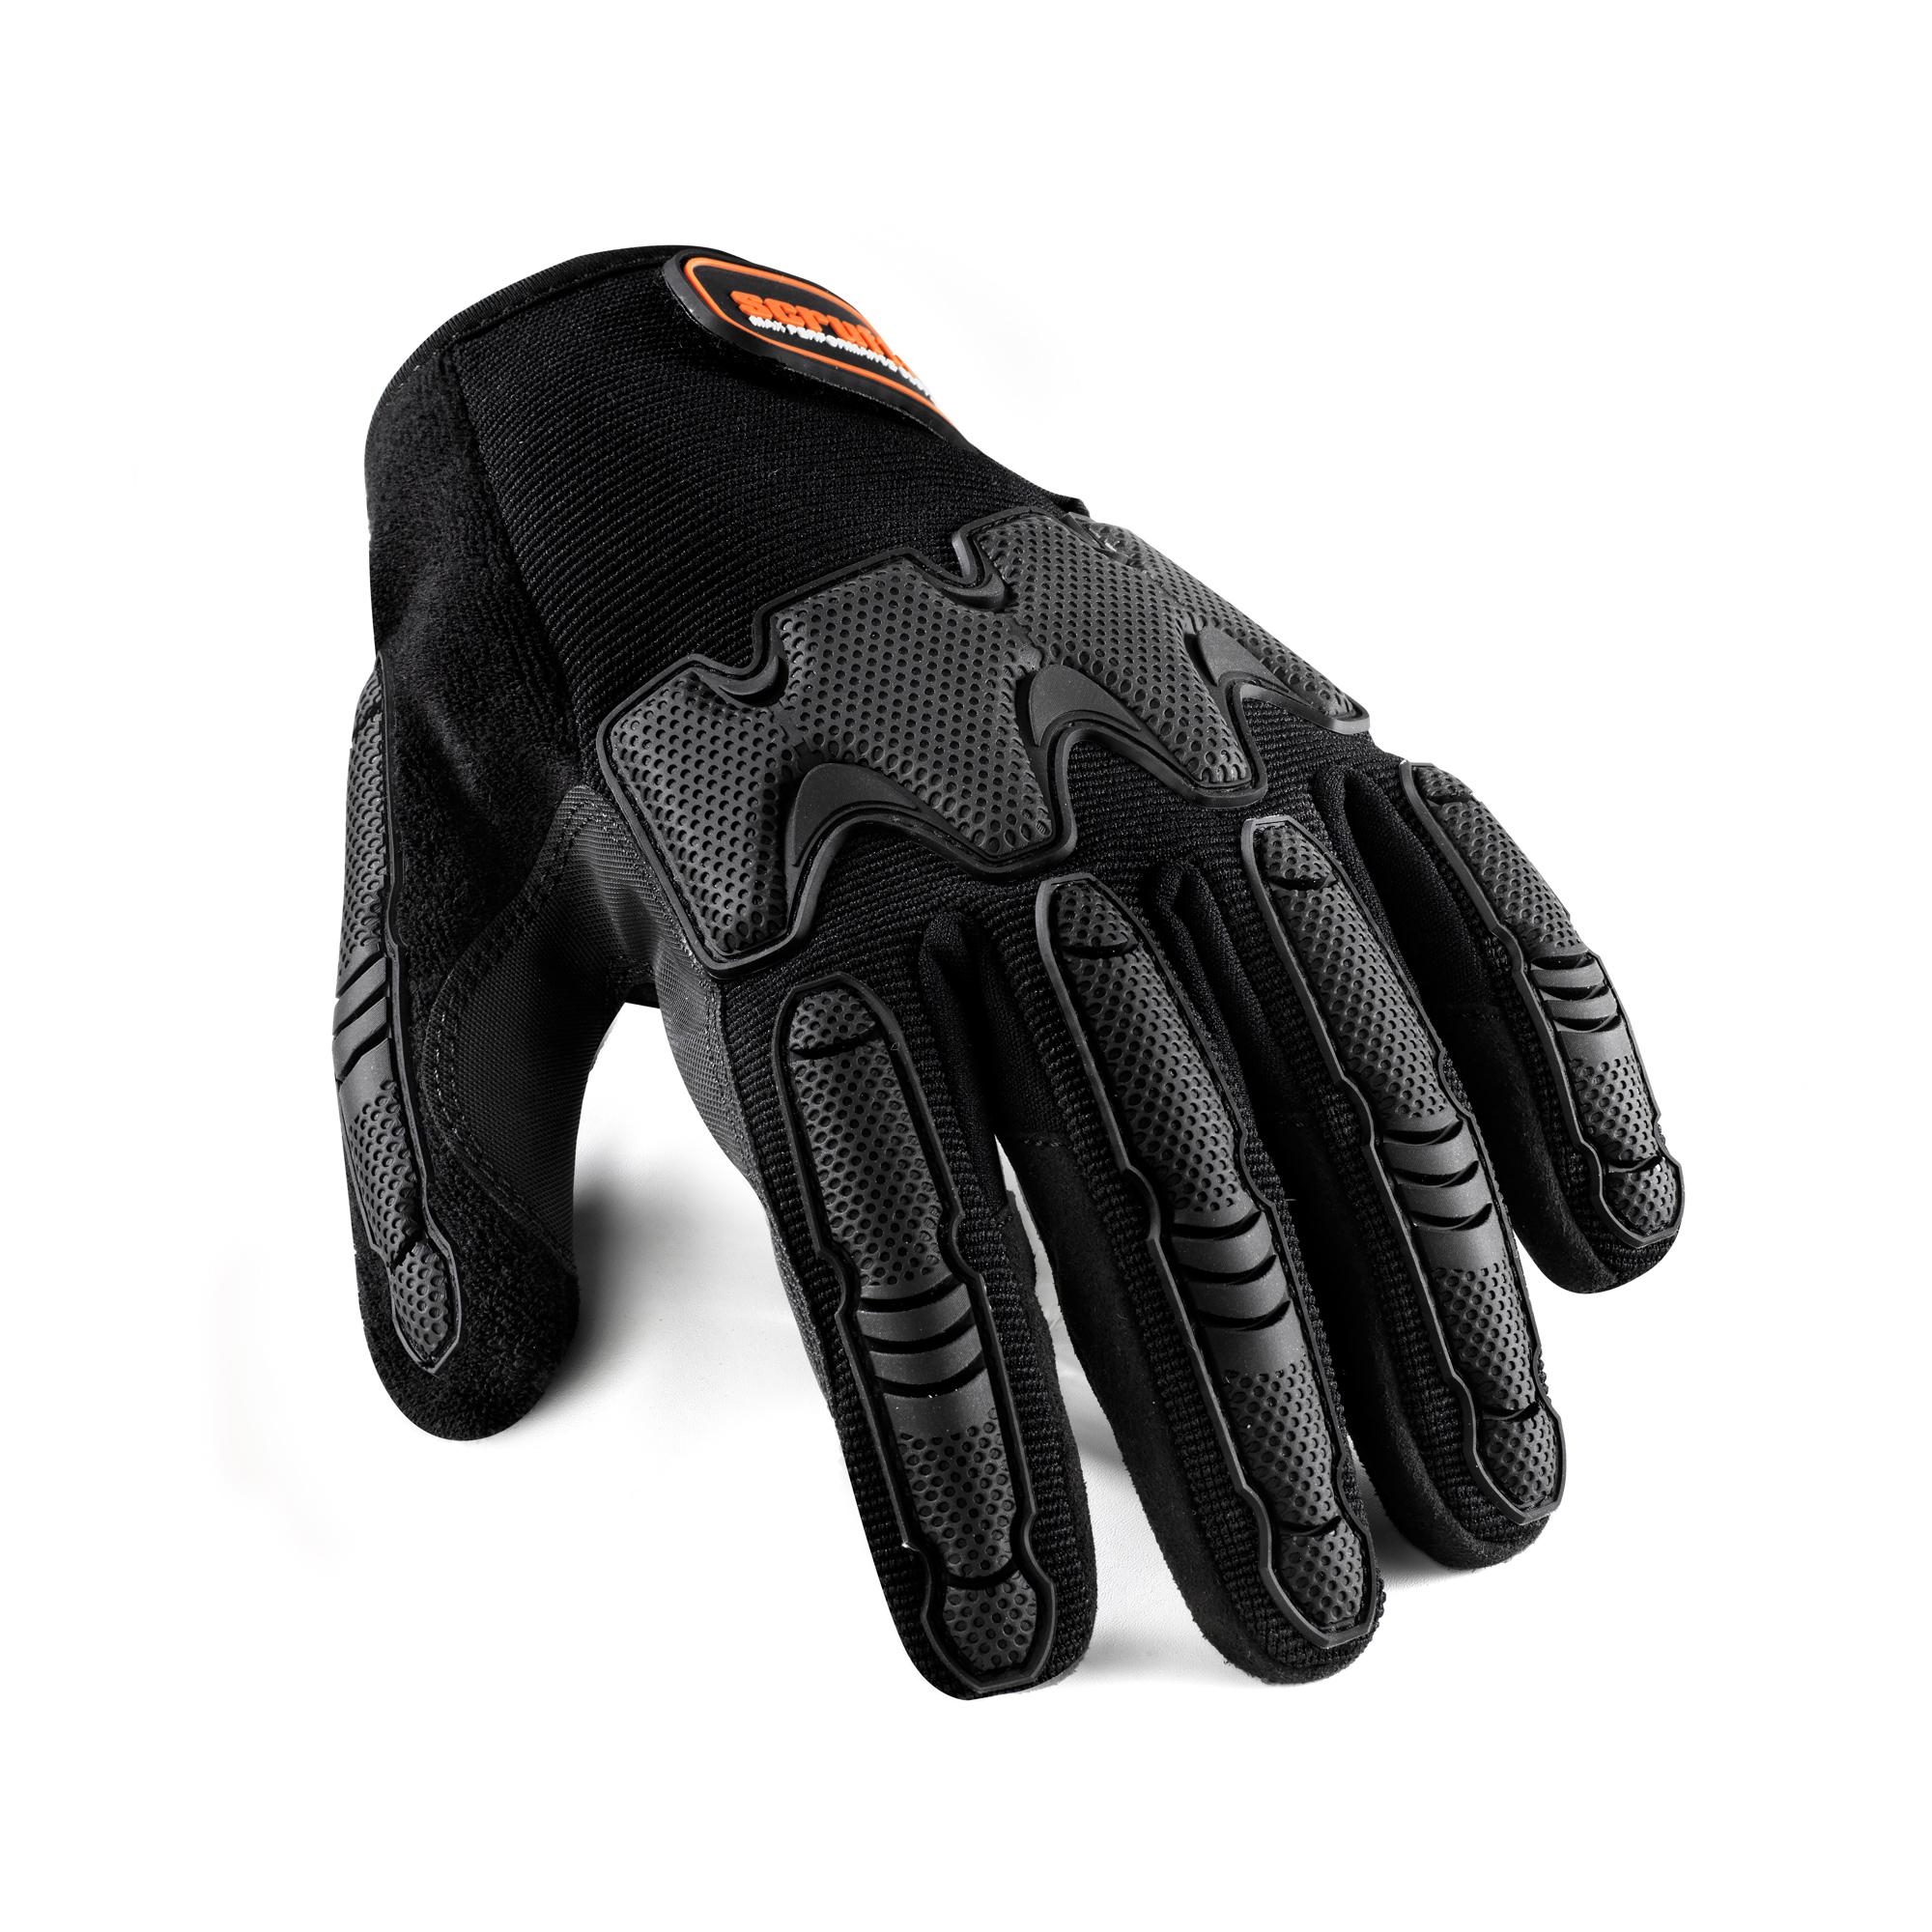 Scruffs Silicone Coated Gloves